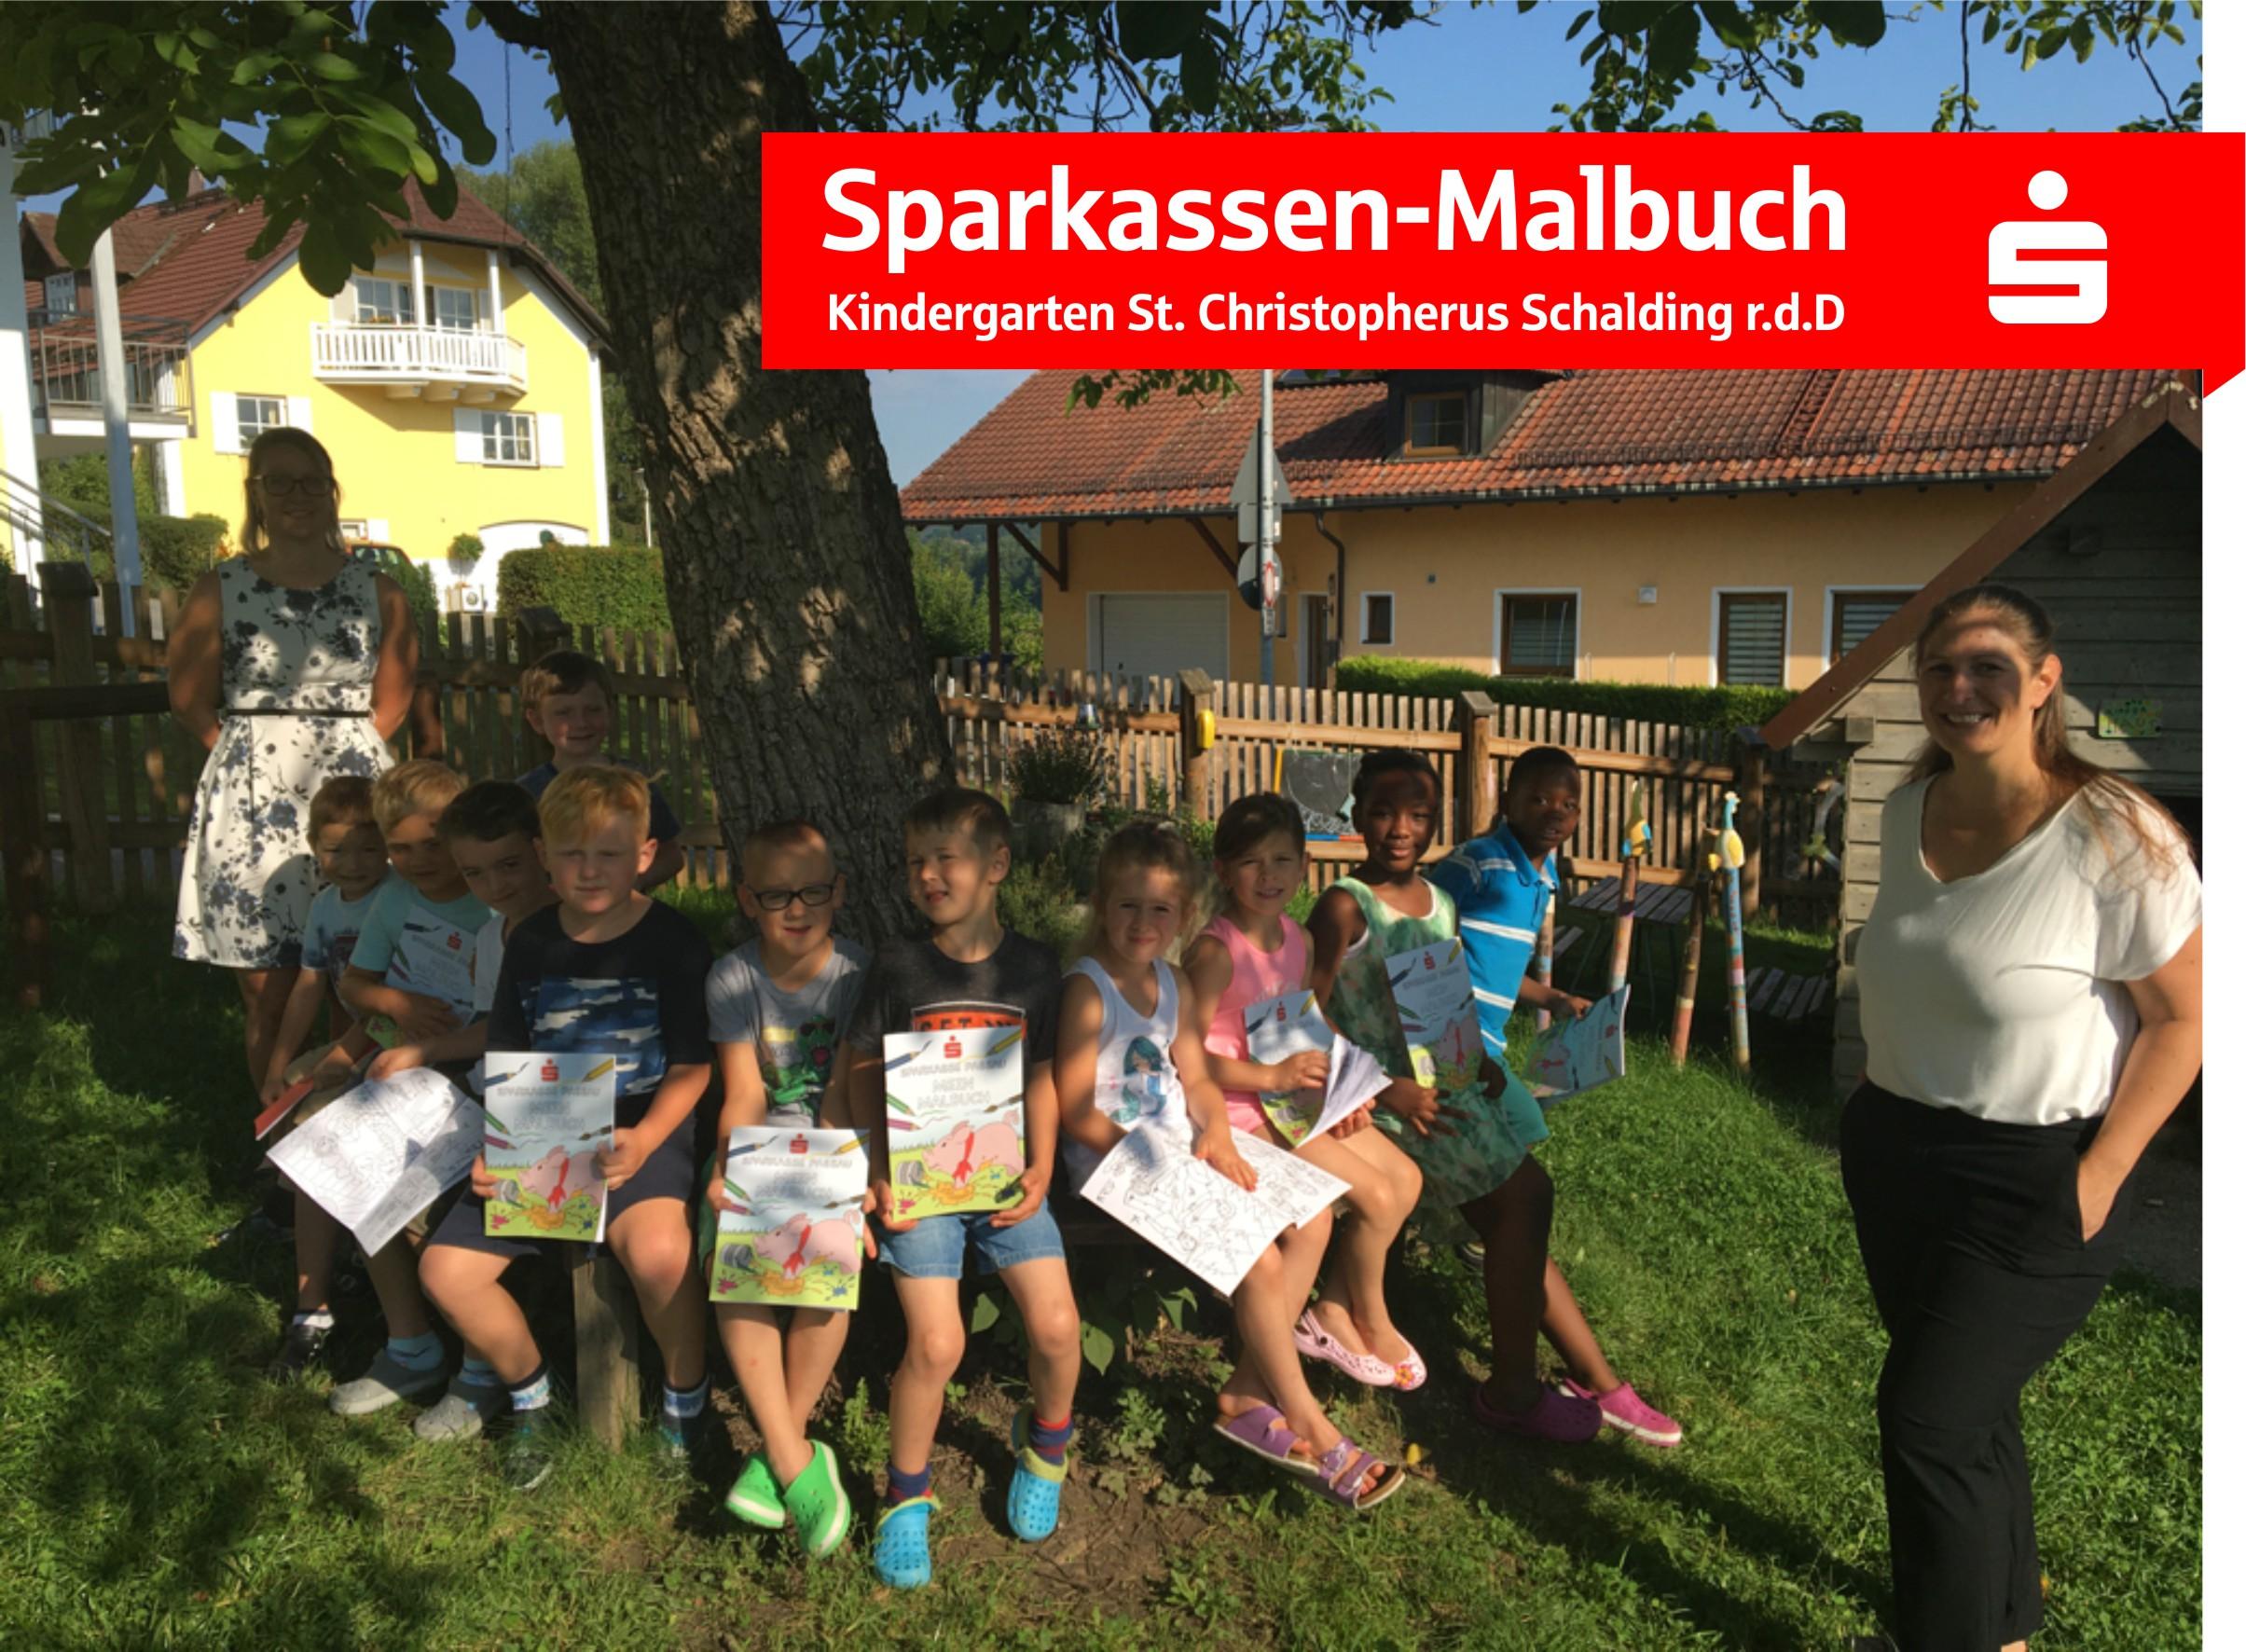 120_Neustift_Foto-2_Kindergarten-St.-Christopherus-Schalding-r.d.D.